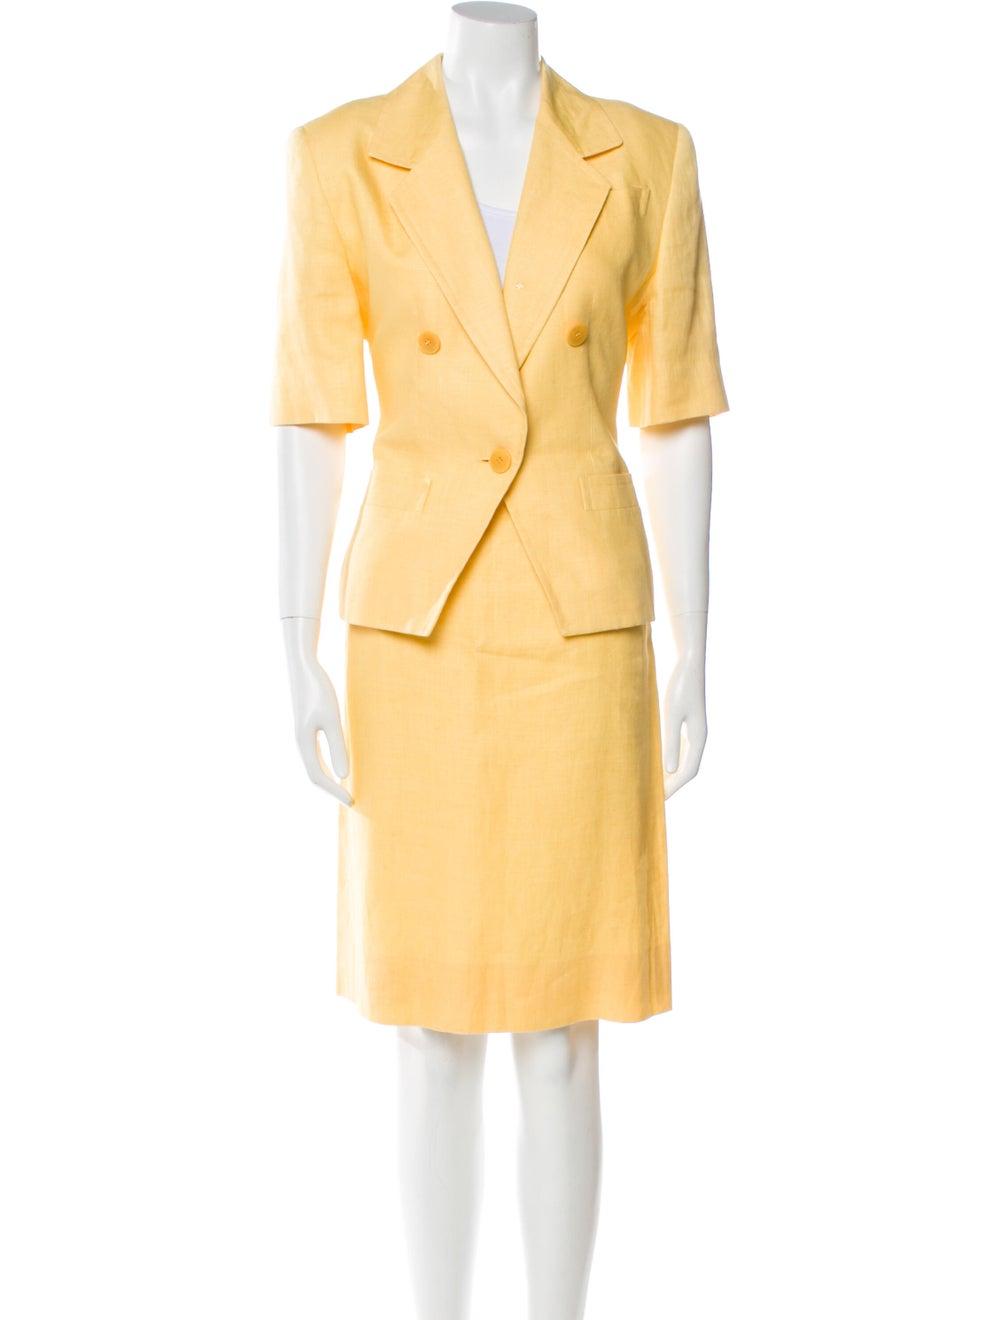 Celine Vintage Linen Skirt Suit Yellow - image 1